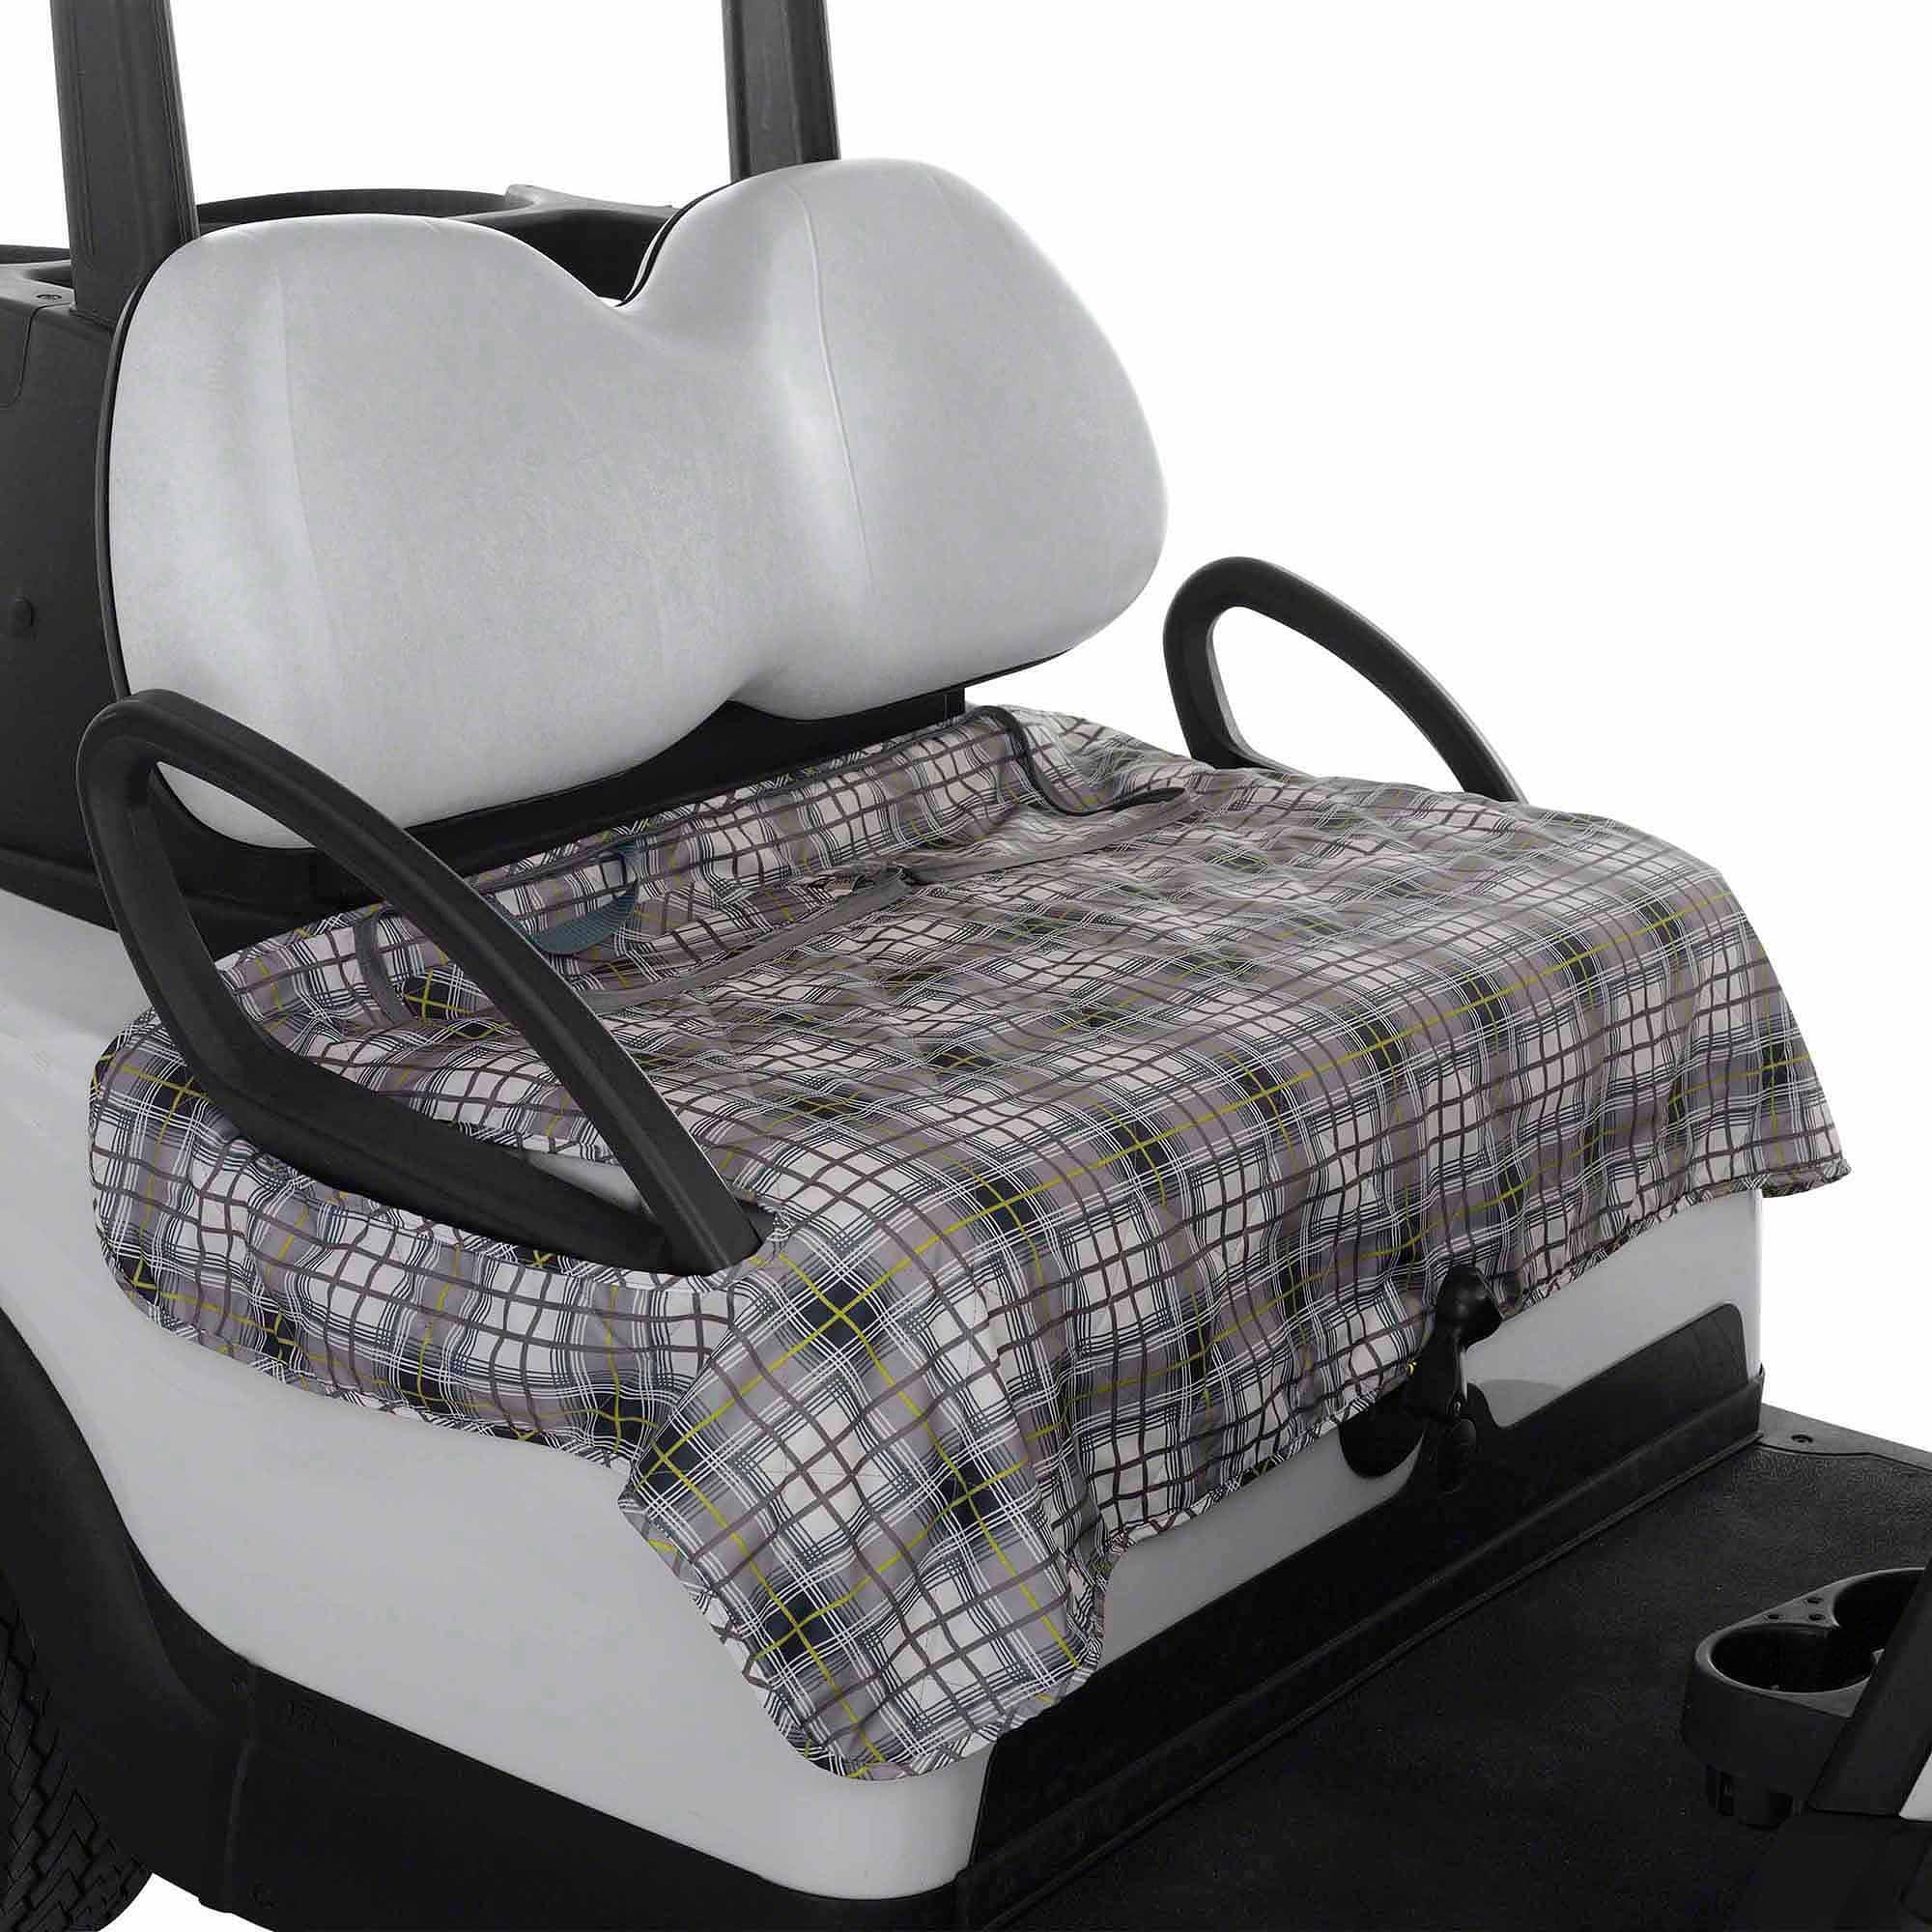 Classic accessories fairway golf cart seat blanket 32 x 54 classic accessories fairway golf cart seat blanket 32 x 54 walmart jeuxipadfo Choice Image